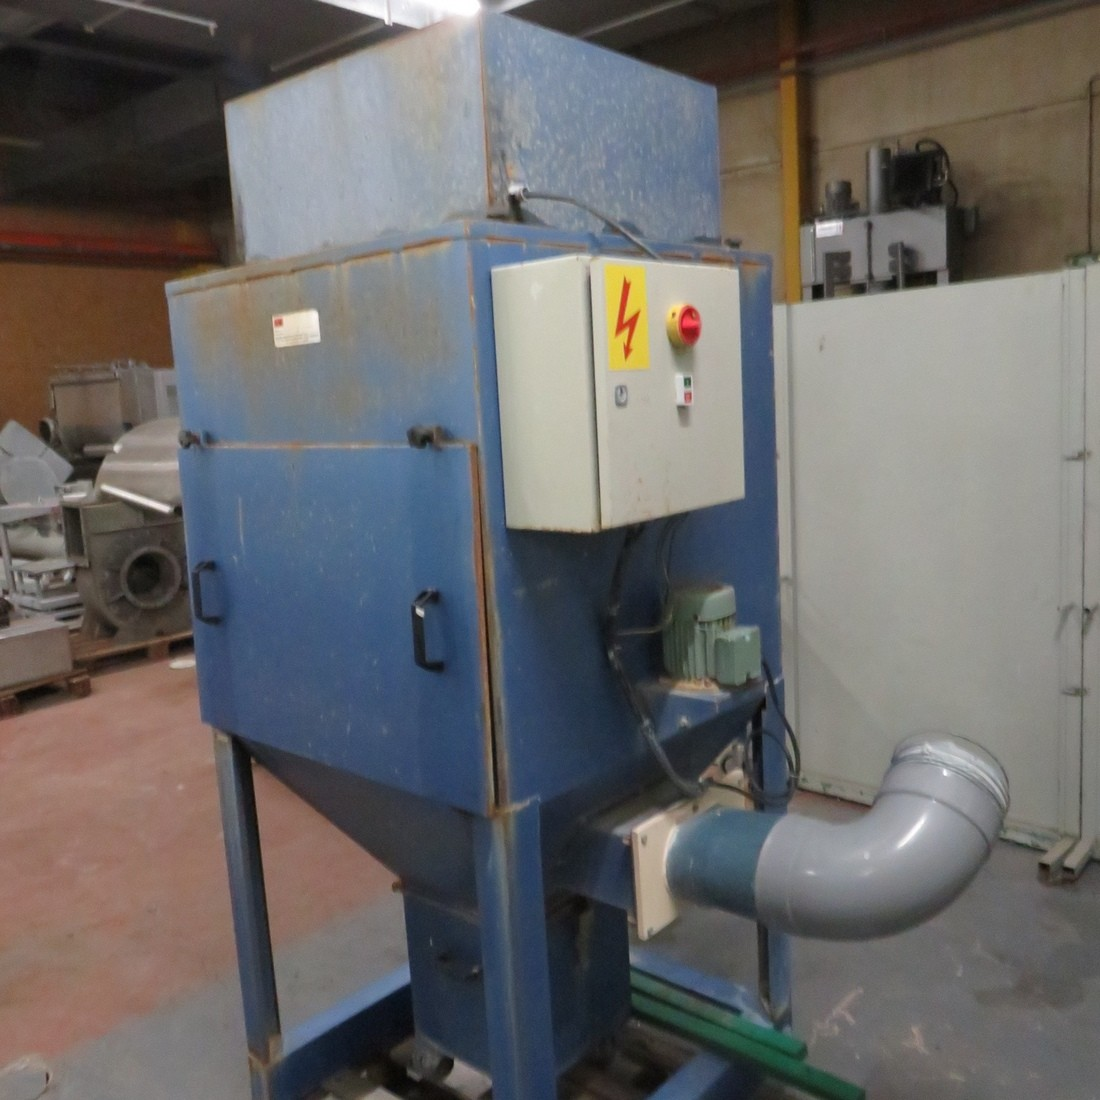 R1J1179 AAF Dust unit filter 16 m² - DAS 250 Type - Hp4